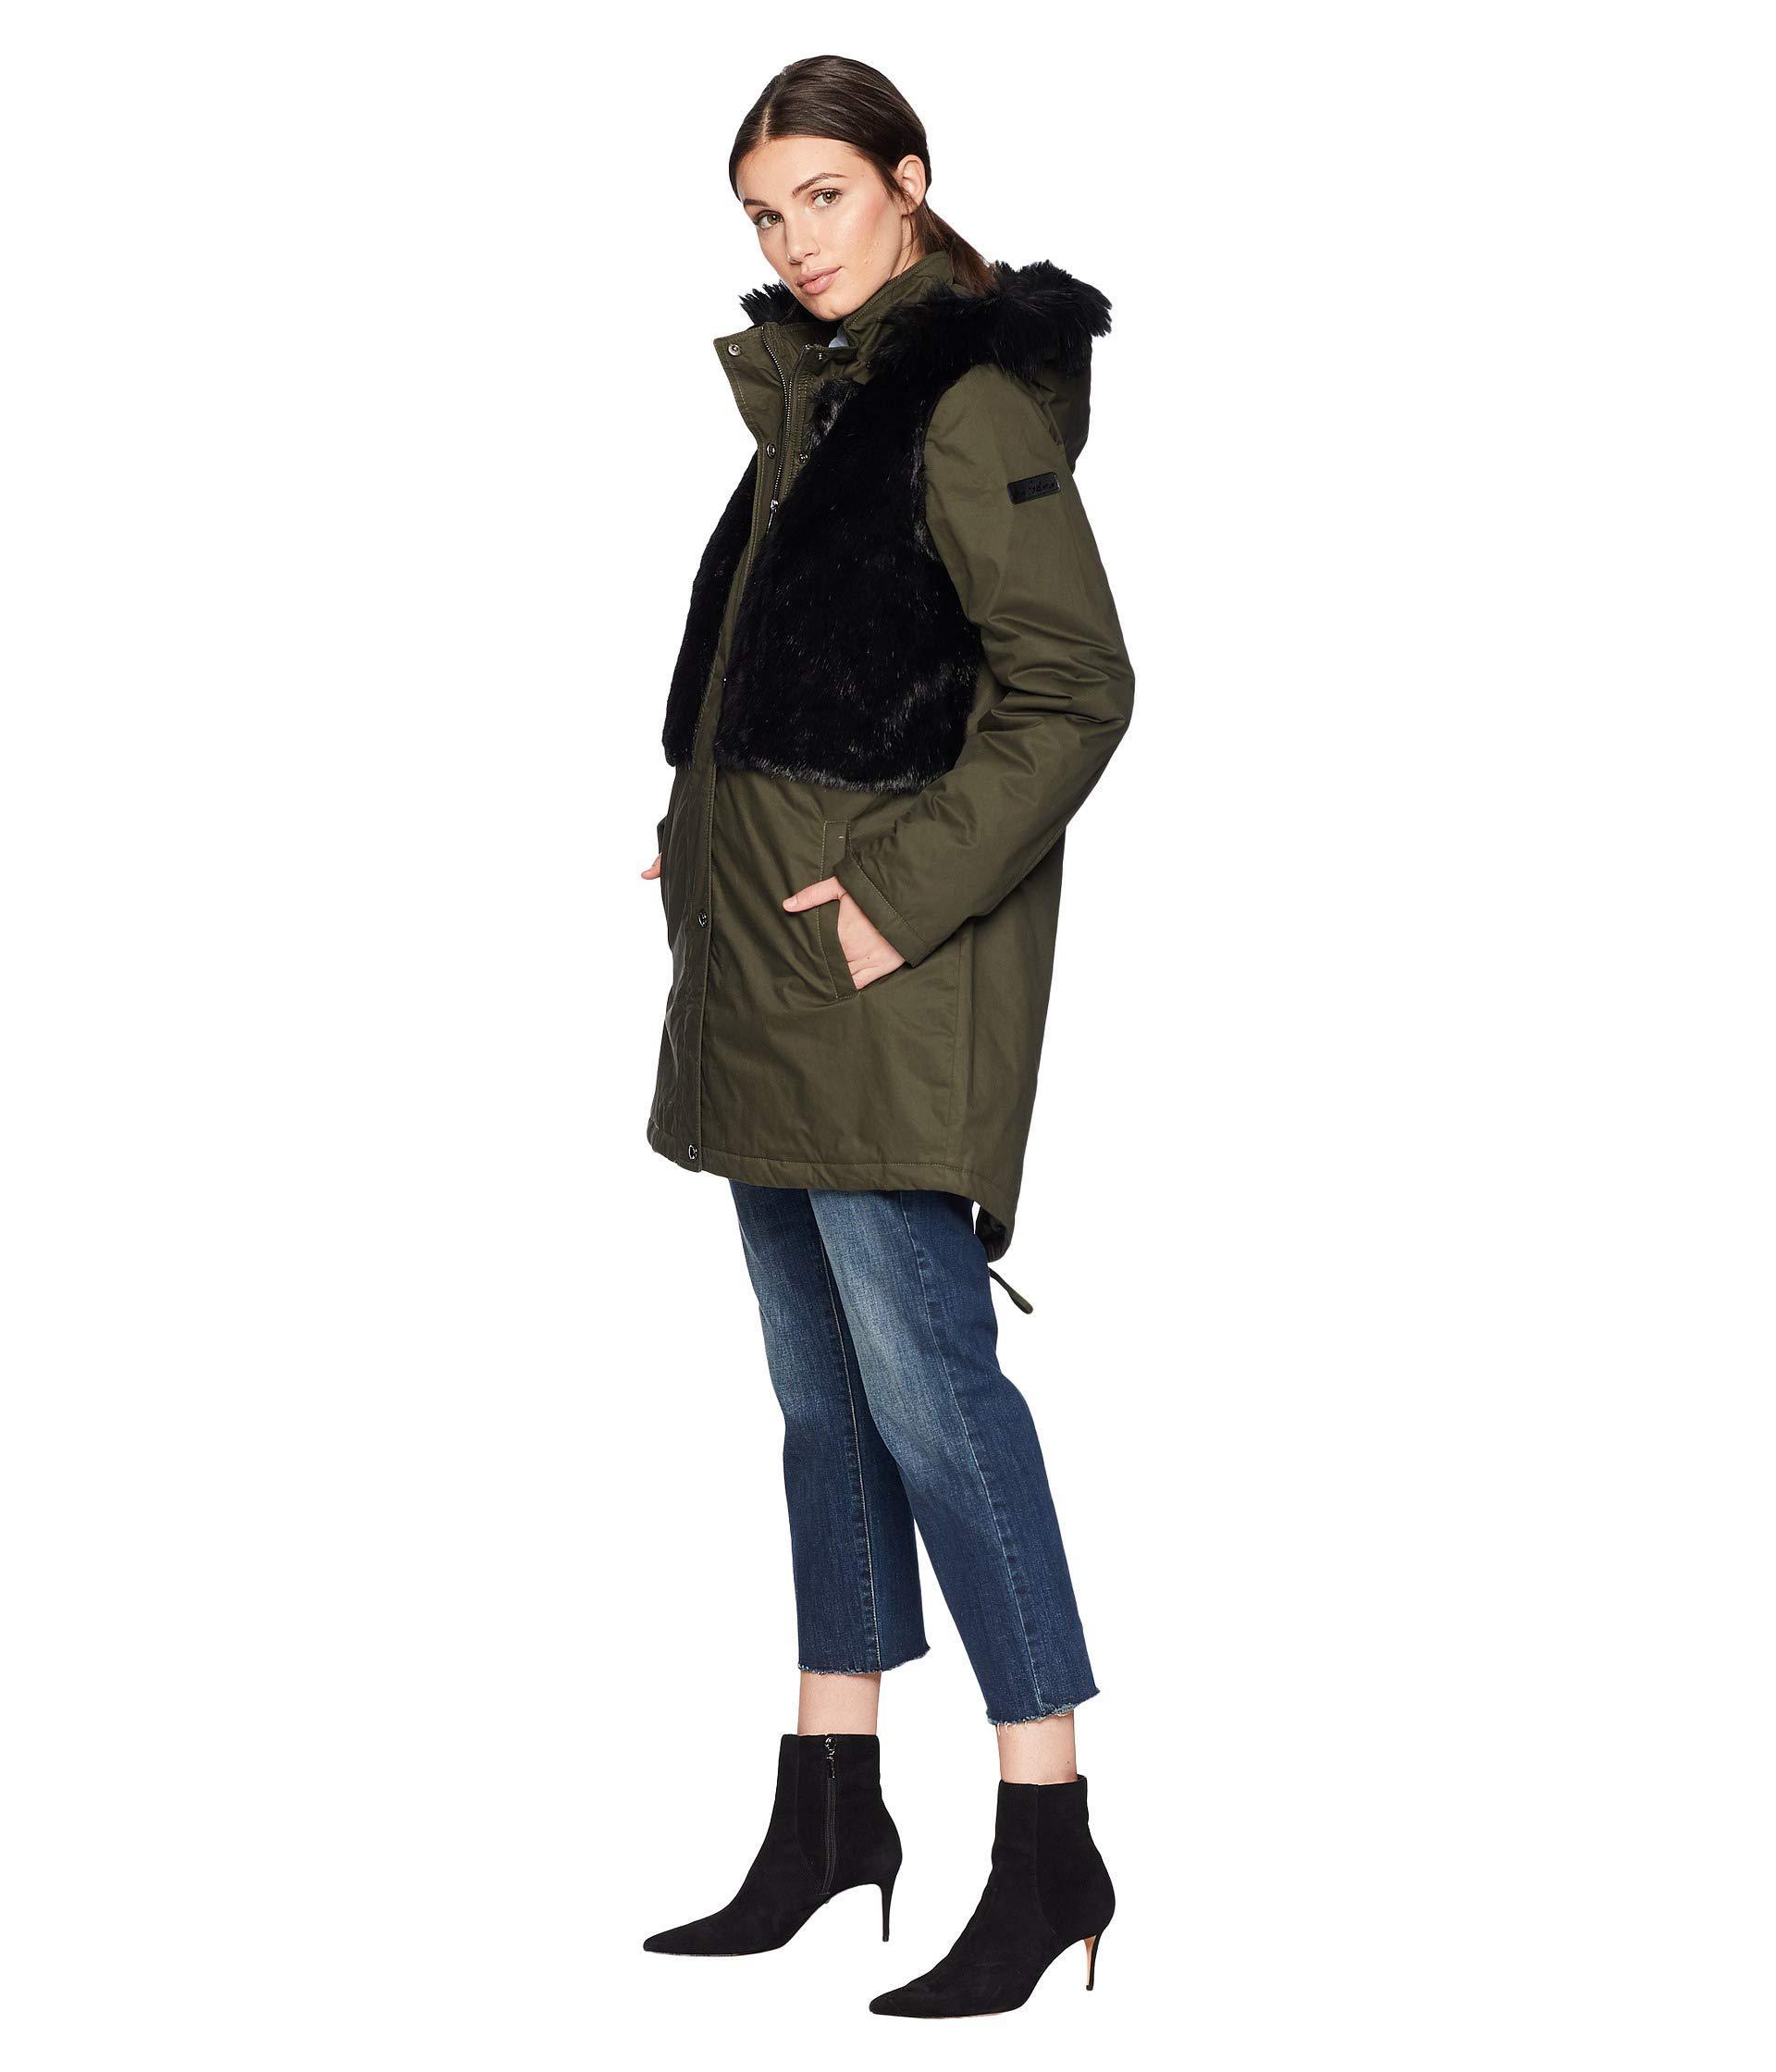 1b16333594c7 Lyst - Sam Edelman Faux Fur Upperbody (loden) Women s Coat